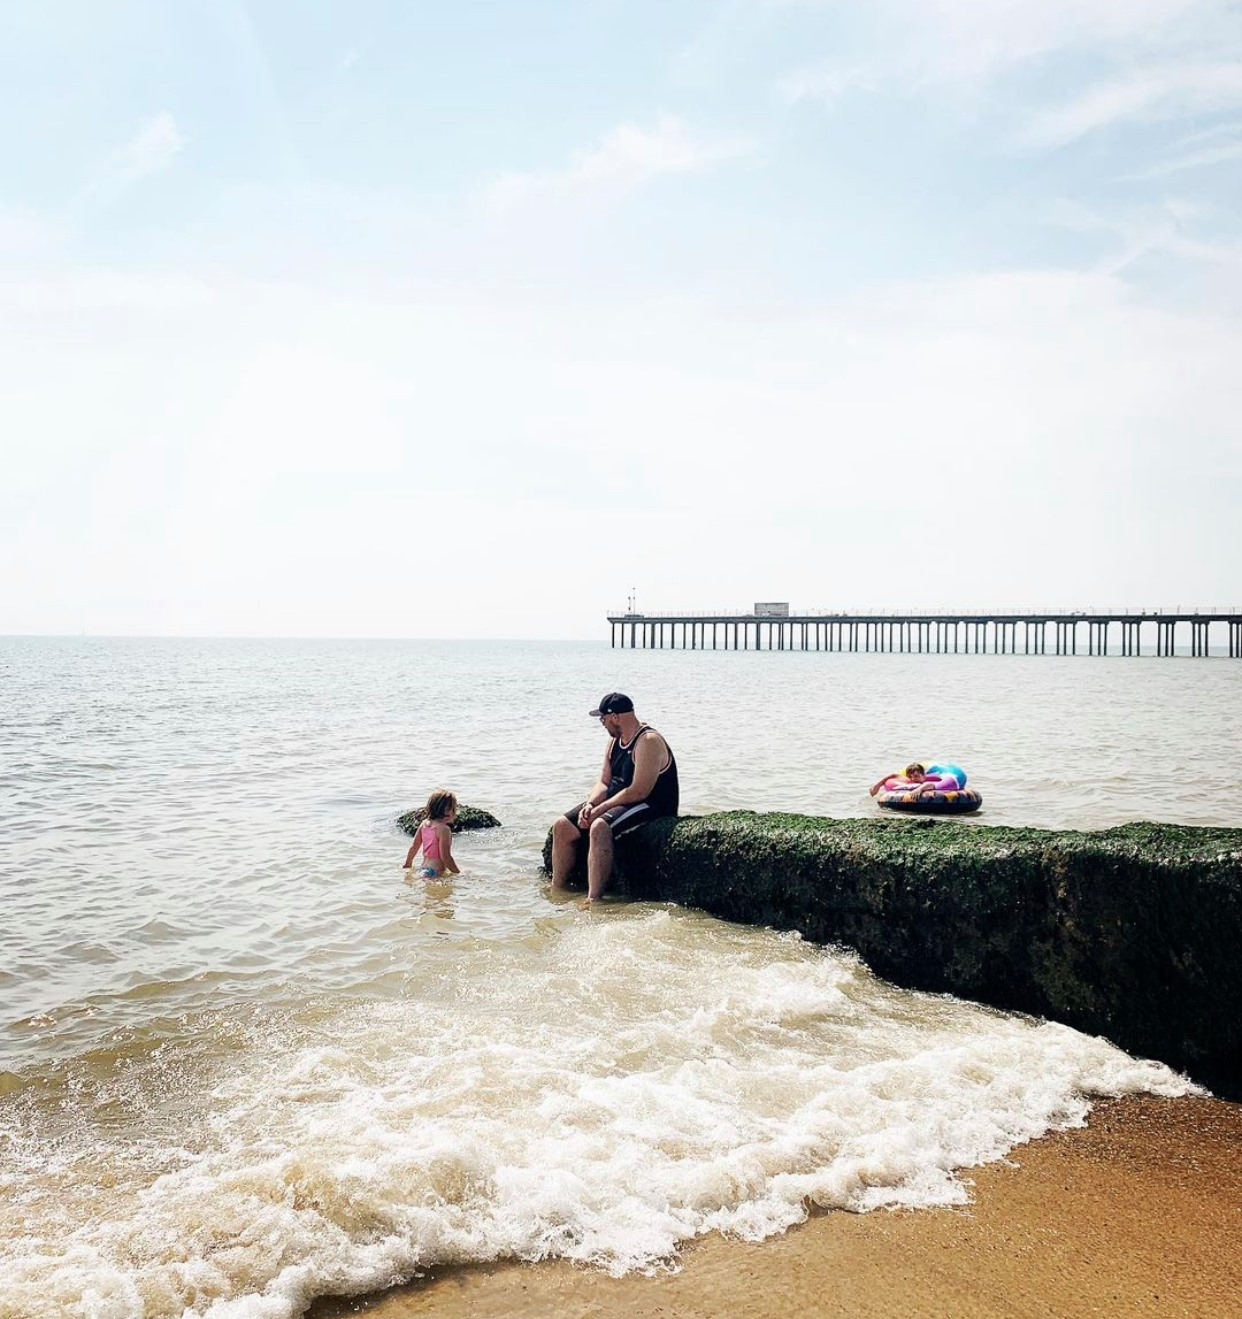 east of england beaches to visit 2021, A suffolk mum blog, Felixstowe